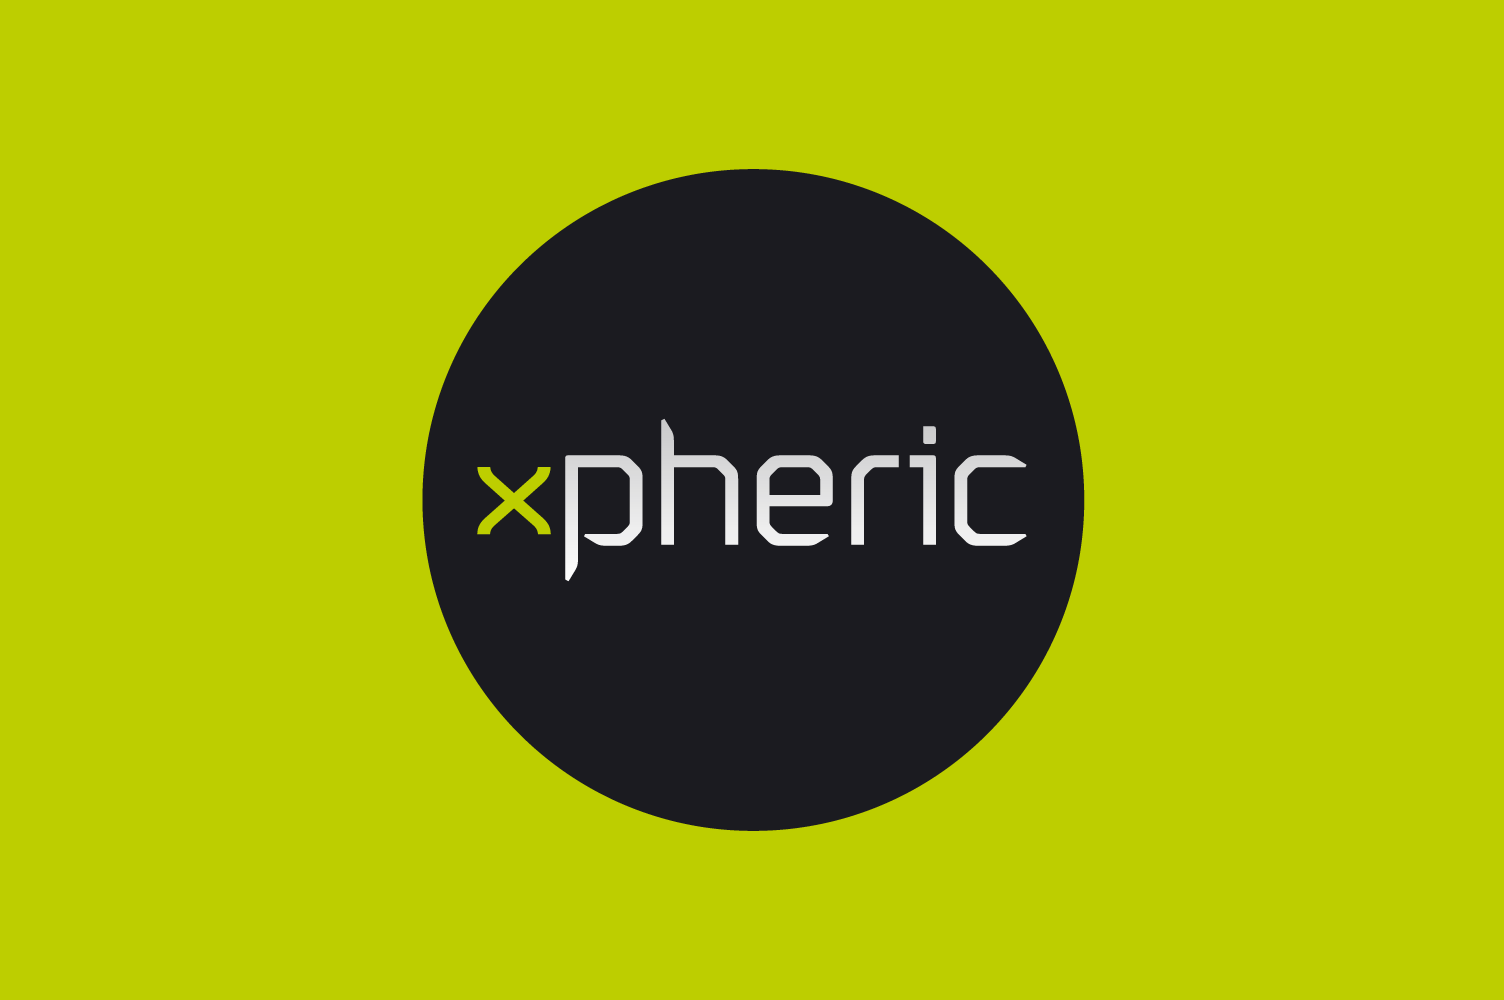 Diseño de marca para xpheric v2